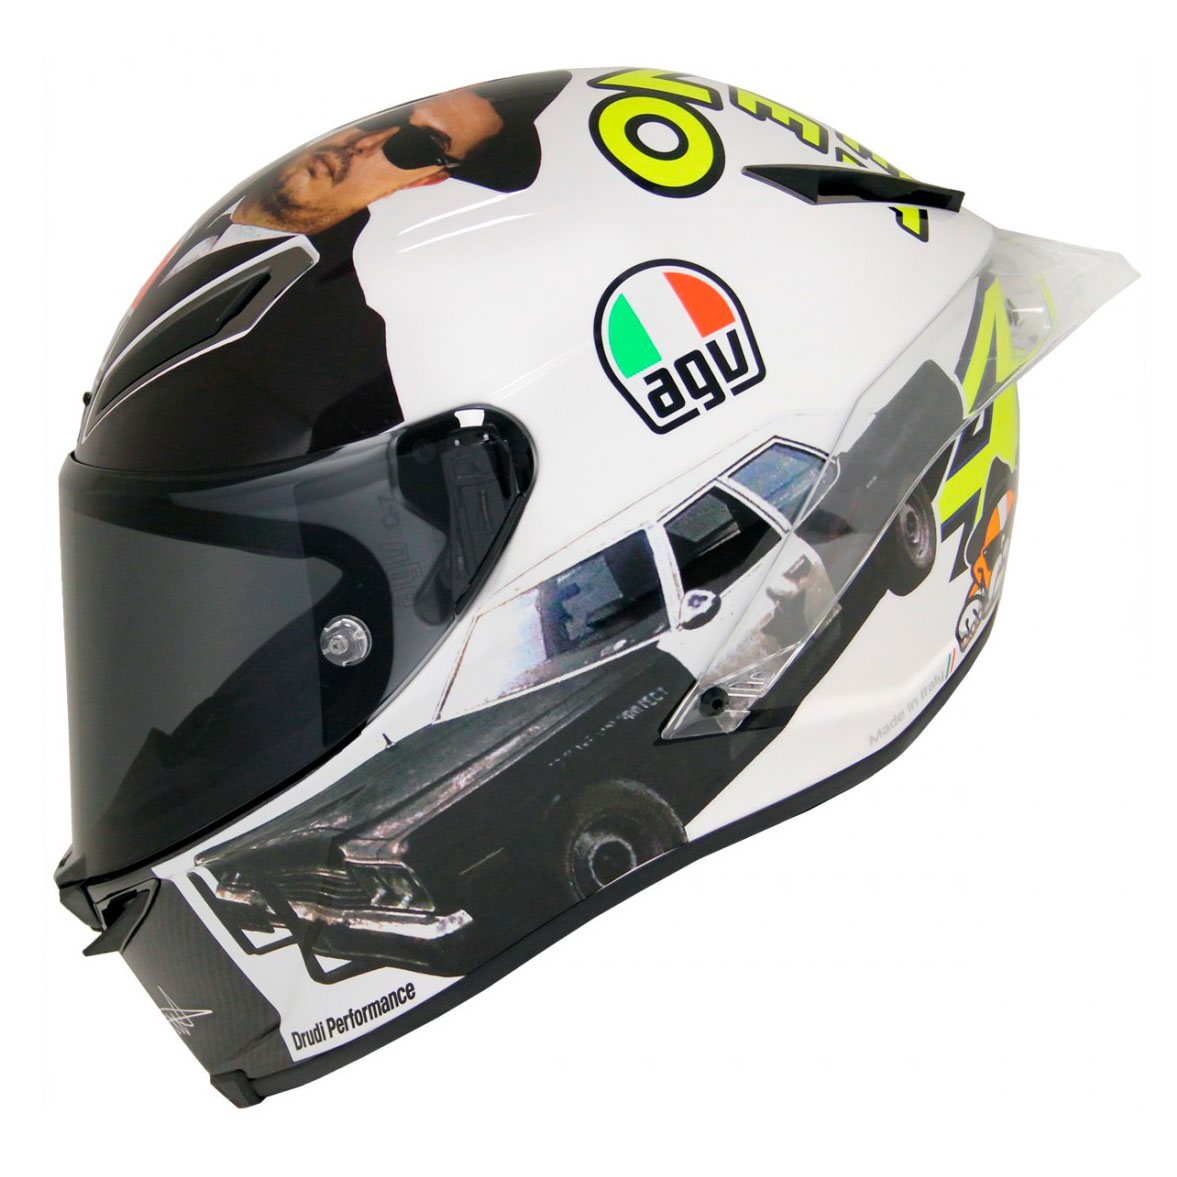 Casco Agv Pista Gp R Rossi Misano 2016 Pinlock En